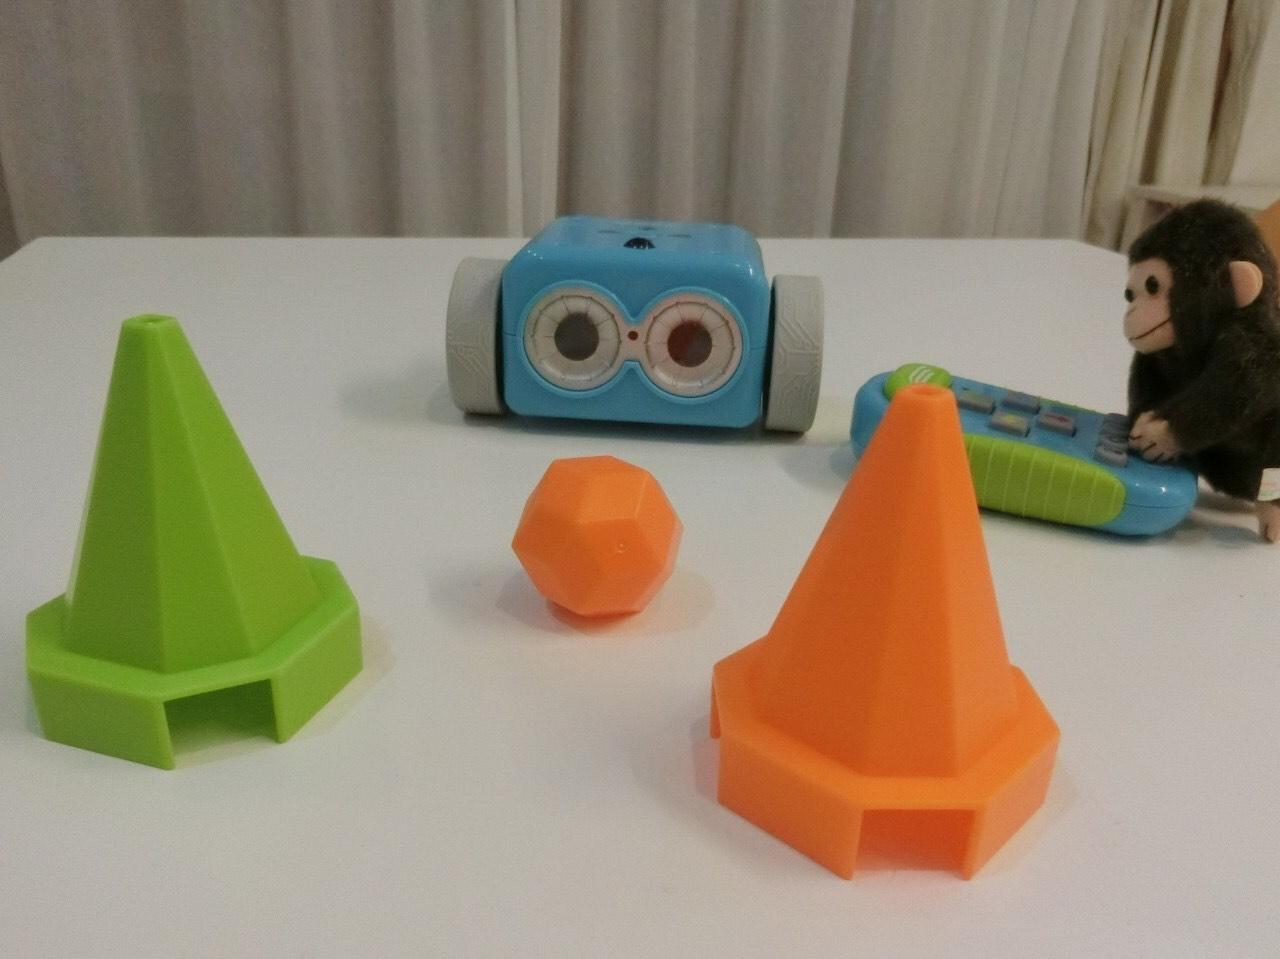 KIZUKIプログラミング遊びの教材紹介「ボットリー」(幼児から小学生低学年向け)